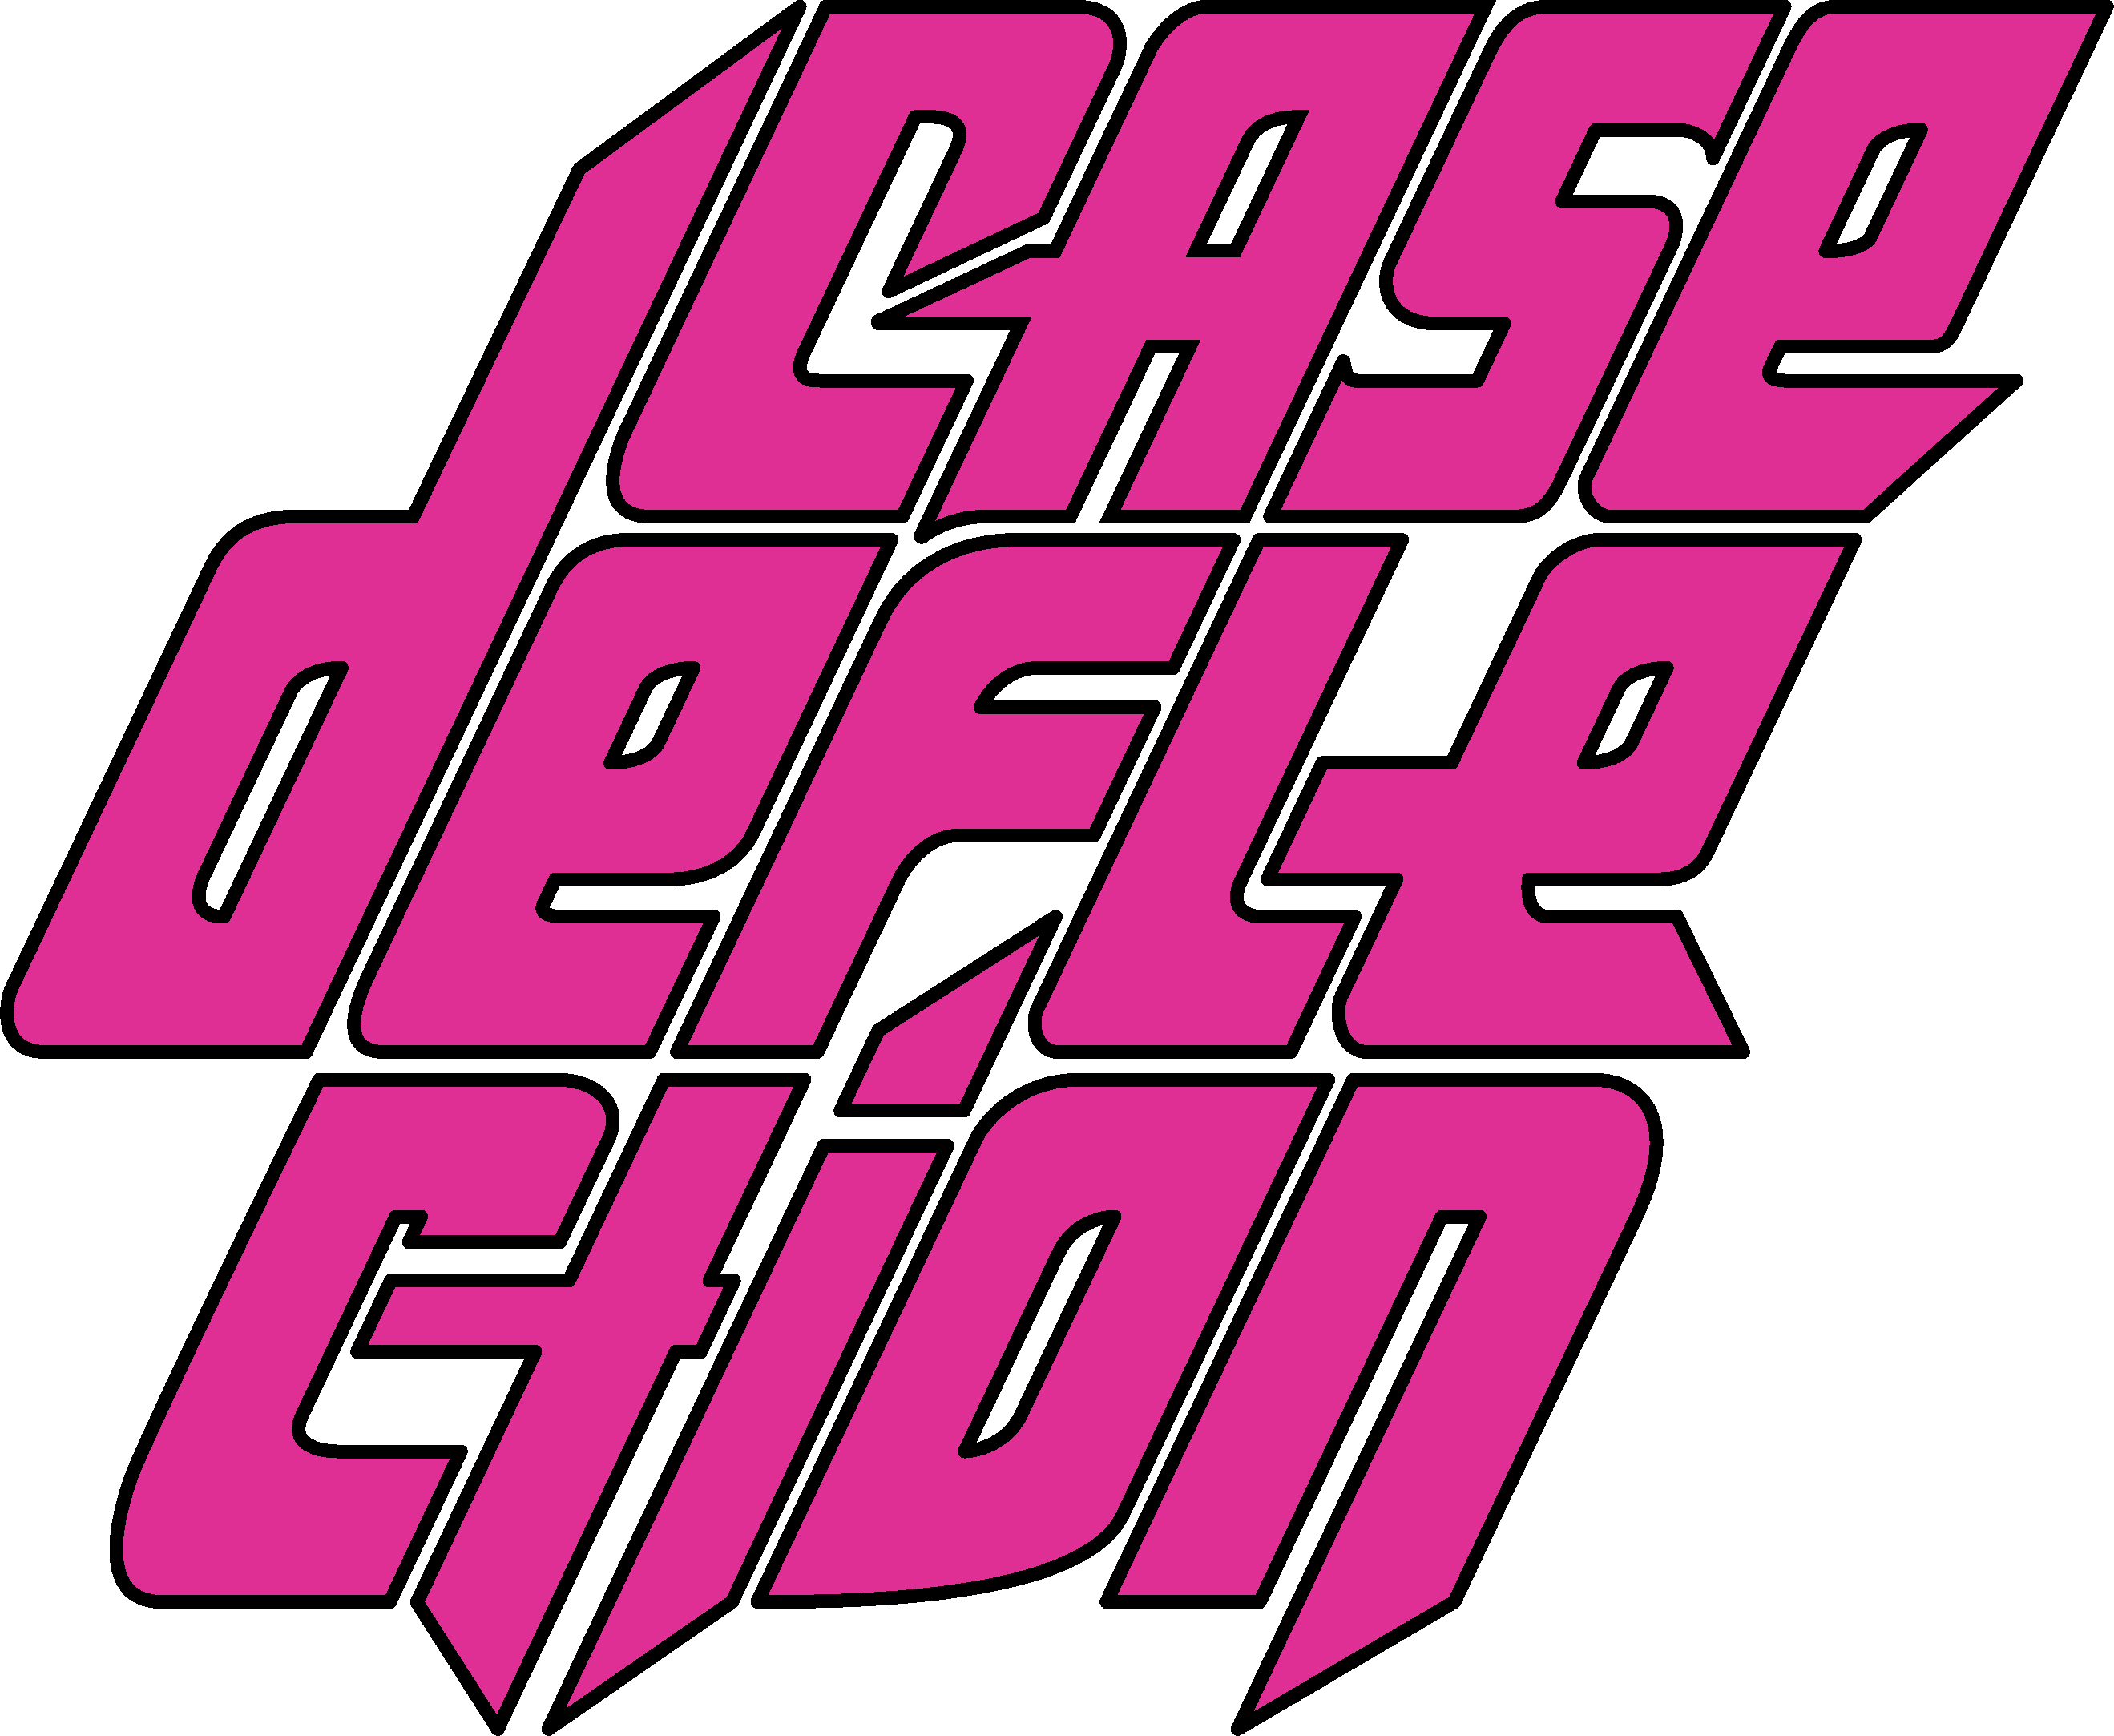 case deflection